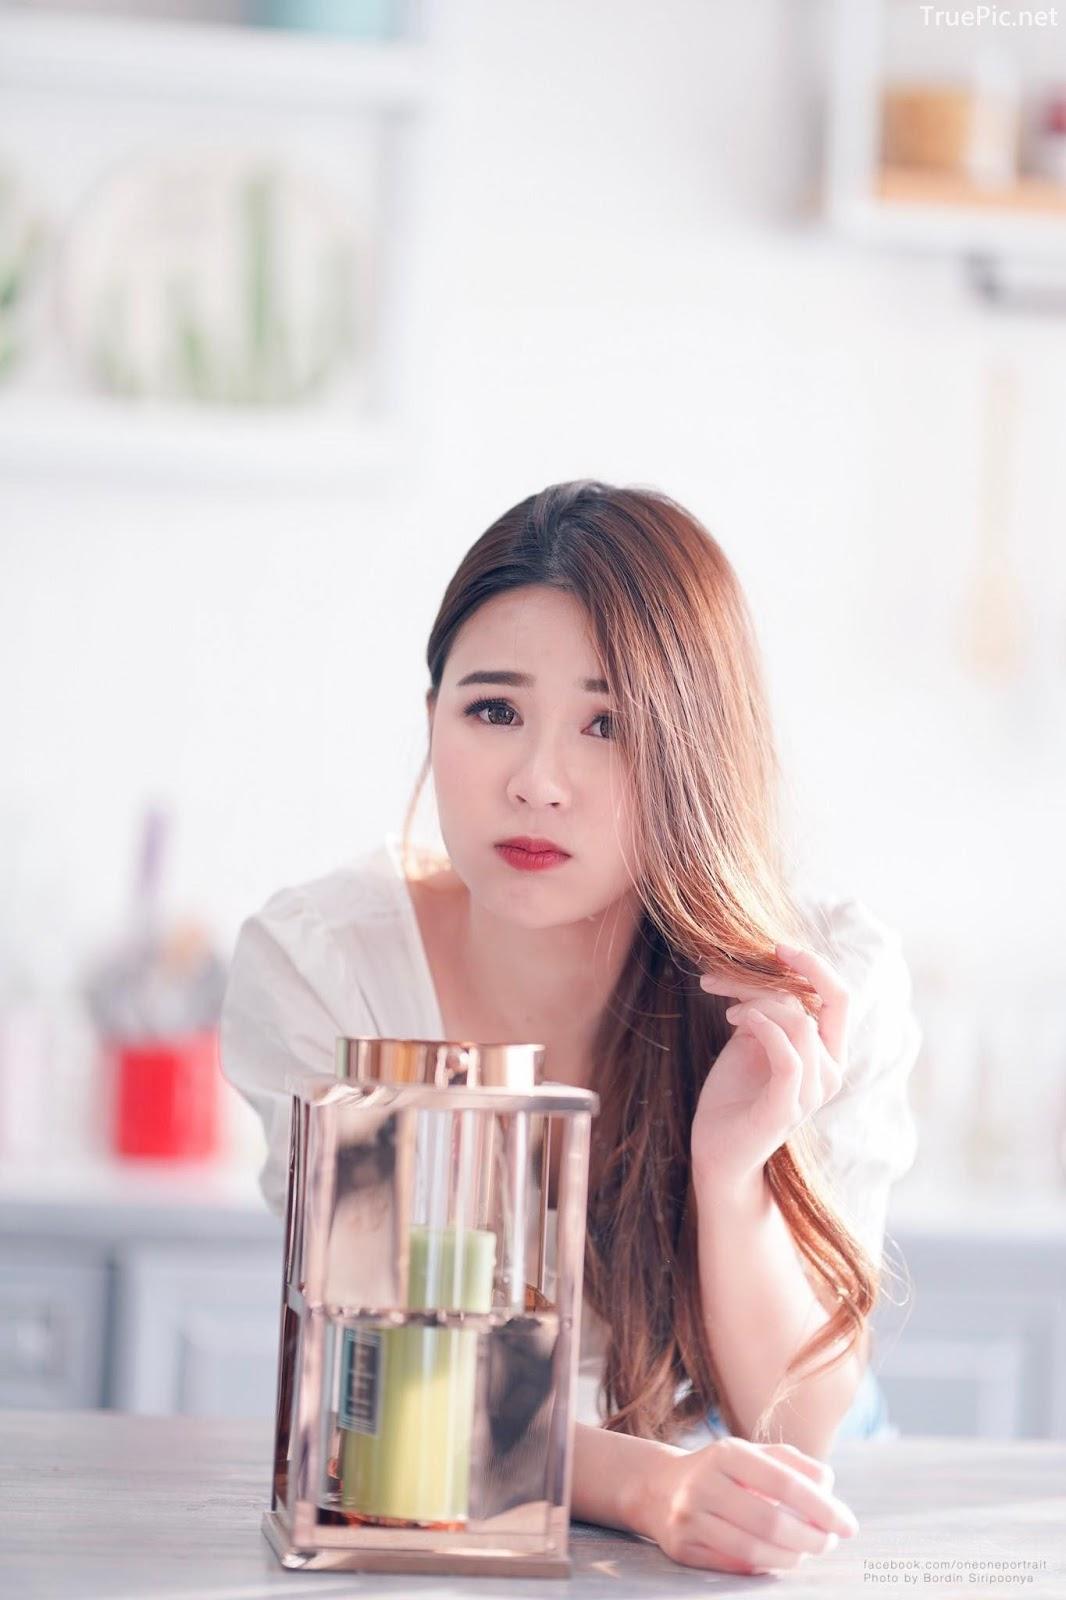 Thailand cute model Supansa Yoopradit (Lorpor) - Lovely smile girl - Picture 8